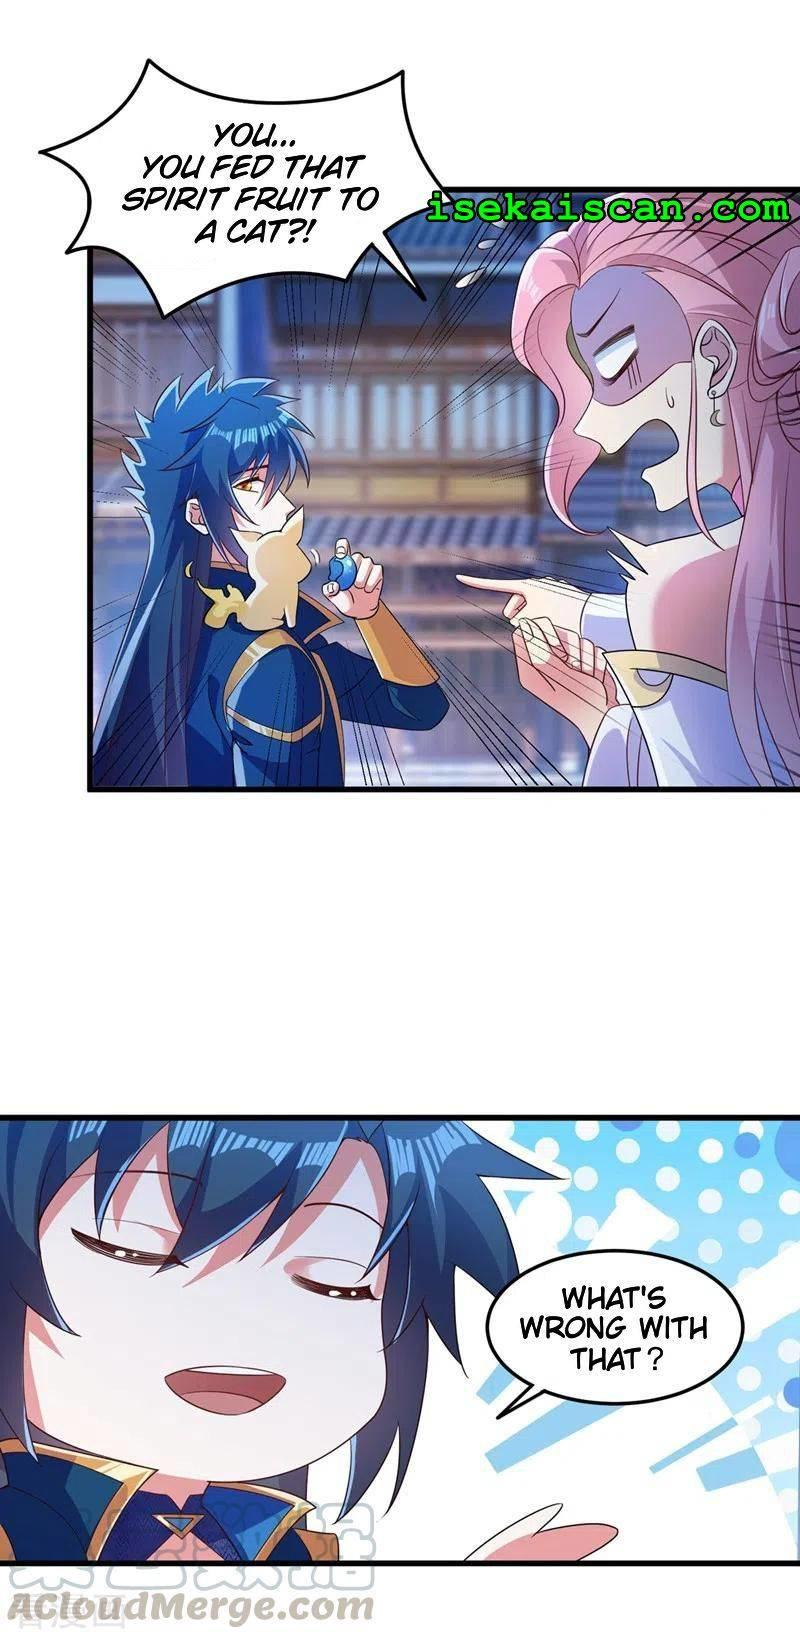 Spirit Sword Sovereign Chapter 428 page 8 - Mangakakalot